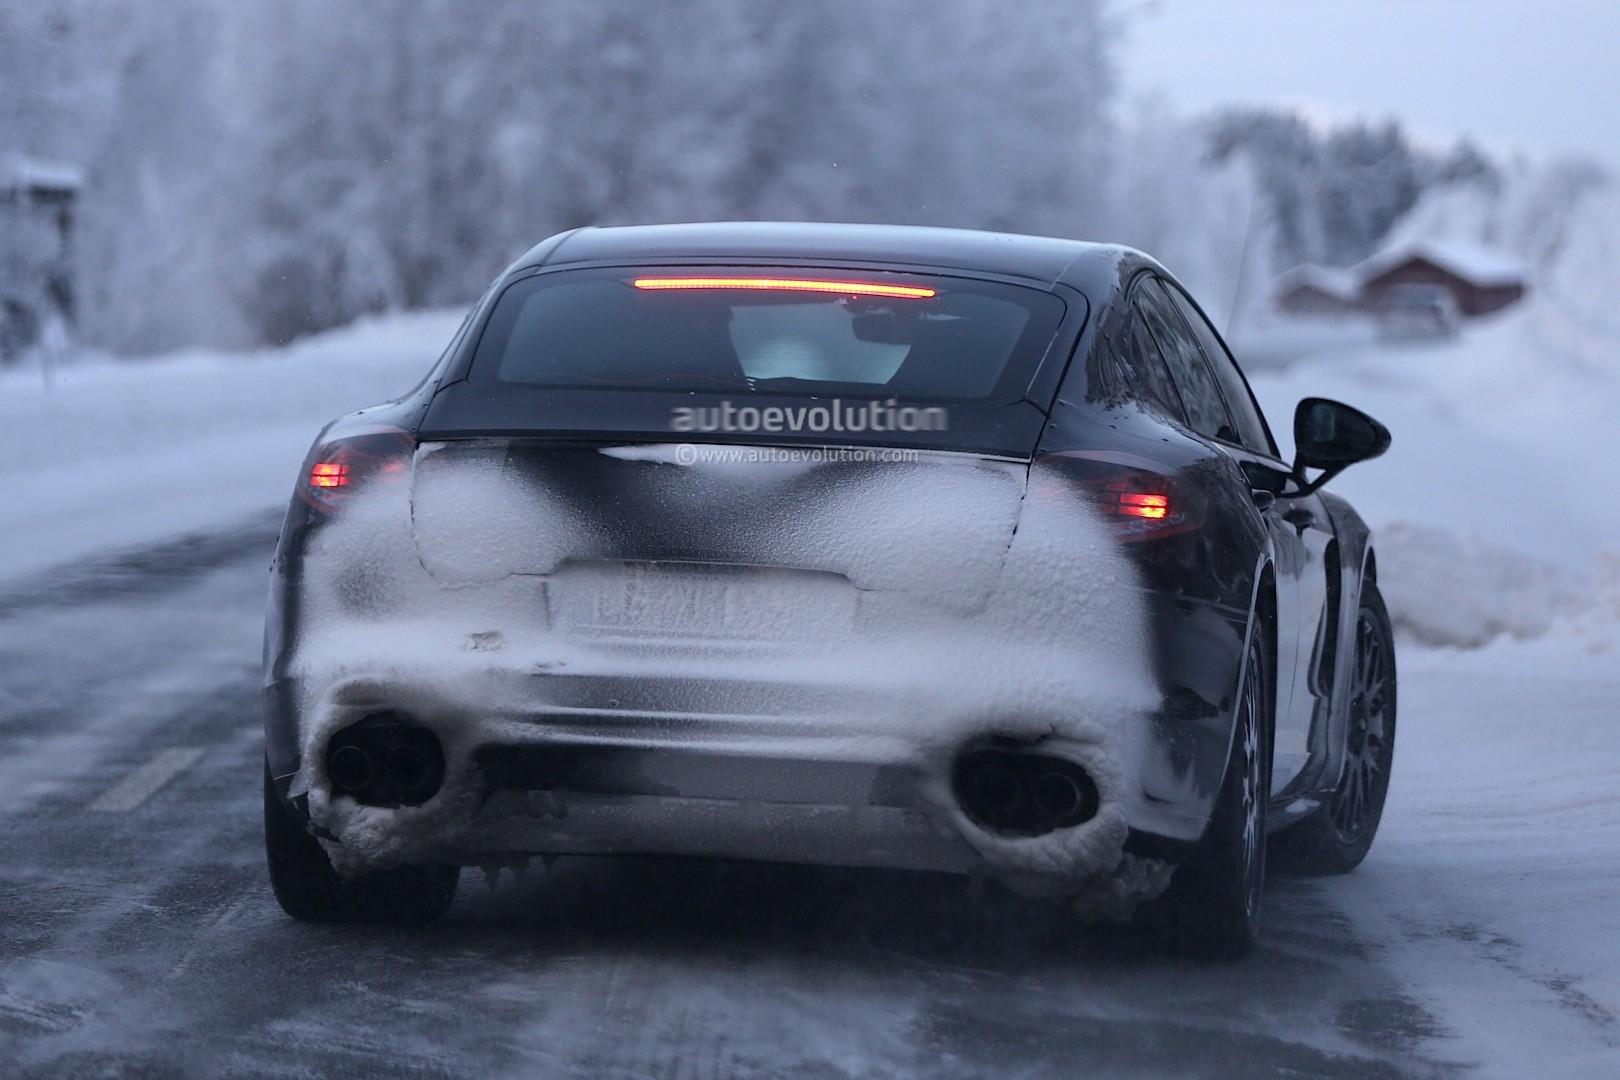 Spyshots 2016 Porsche Panamera Prototype Undergoes Winter